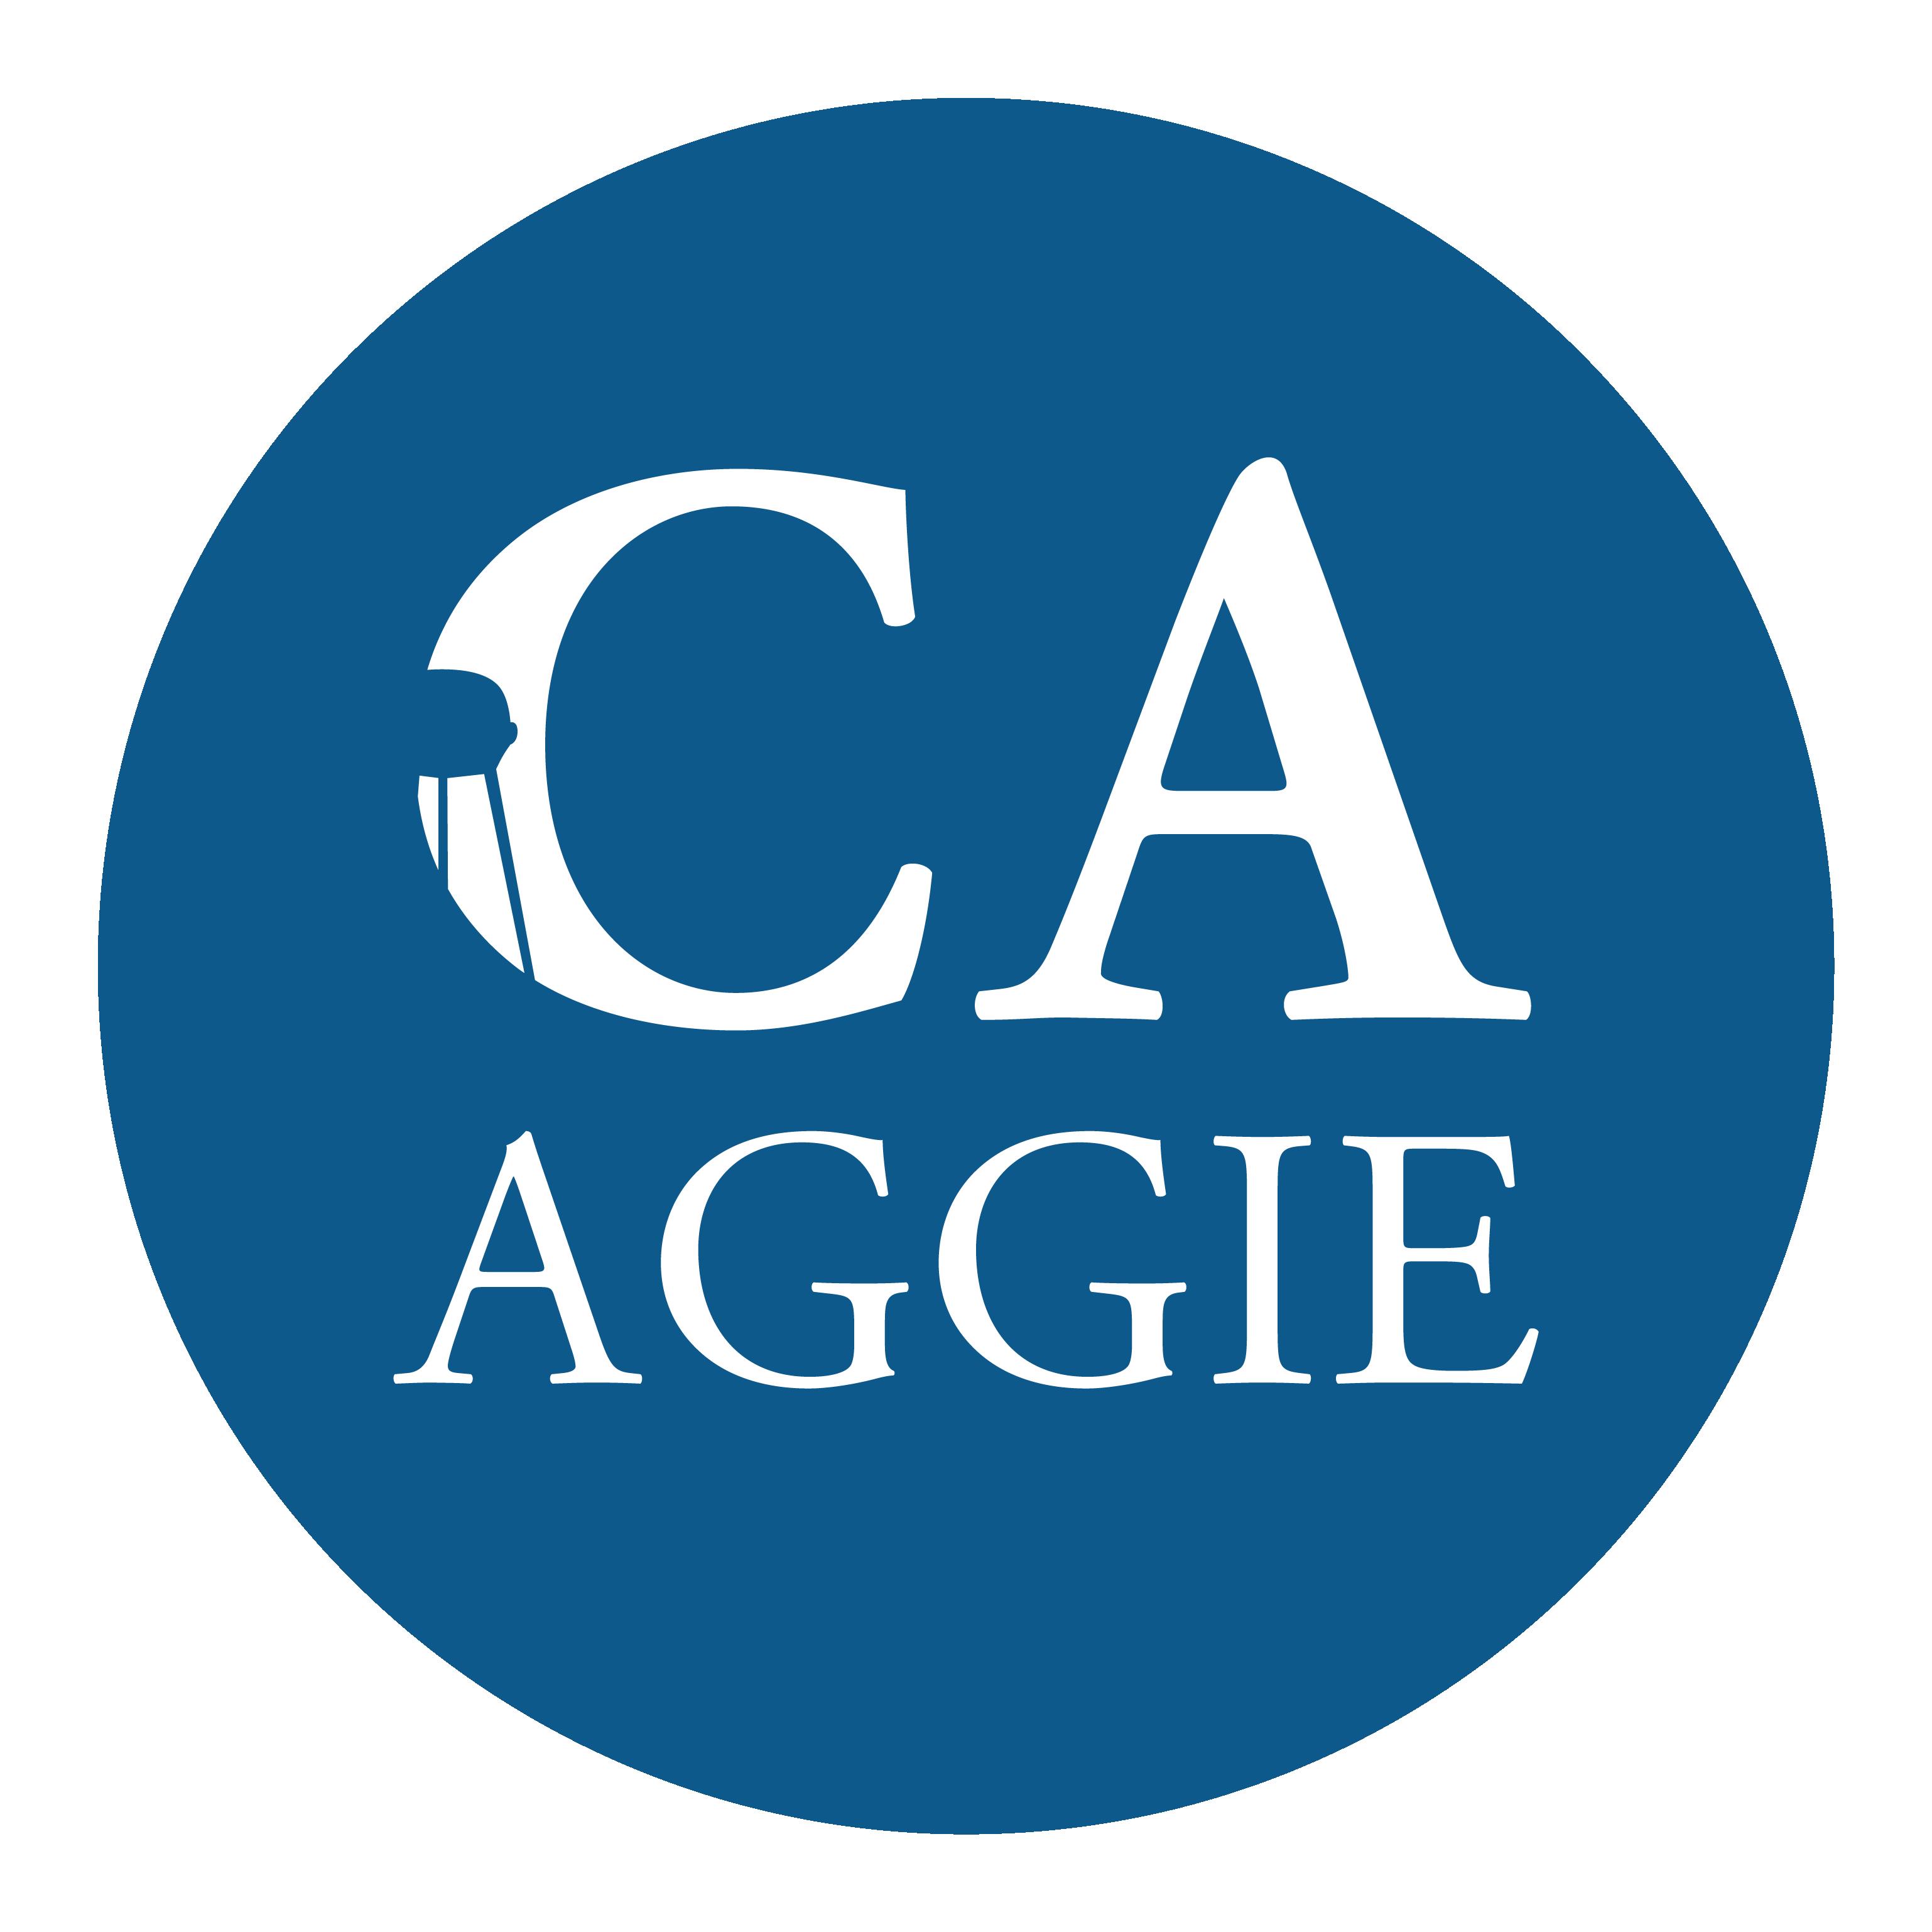 The California Aggie